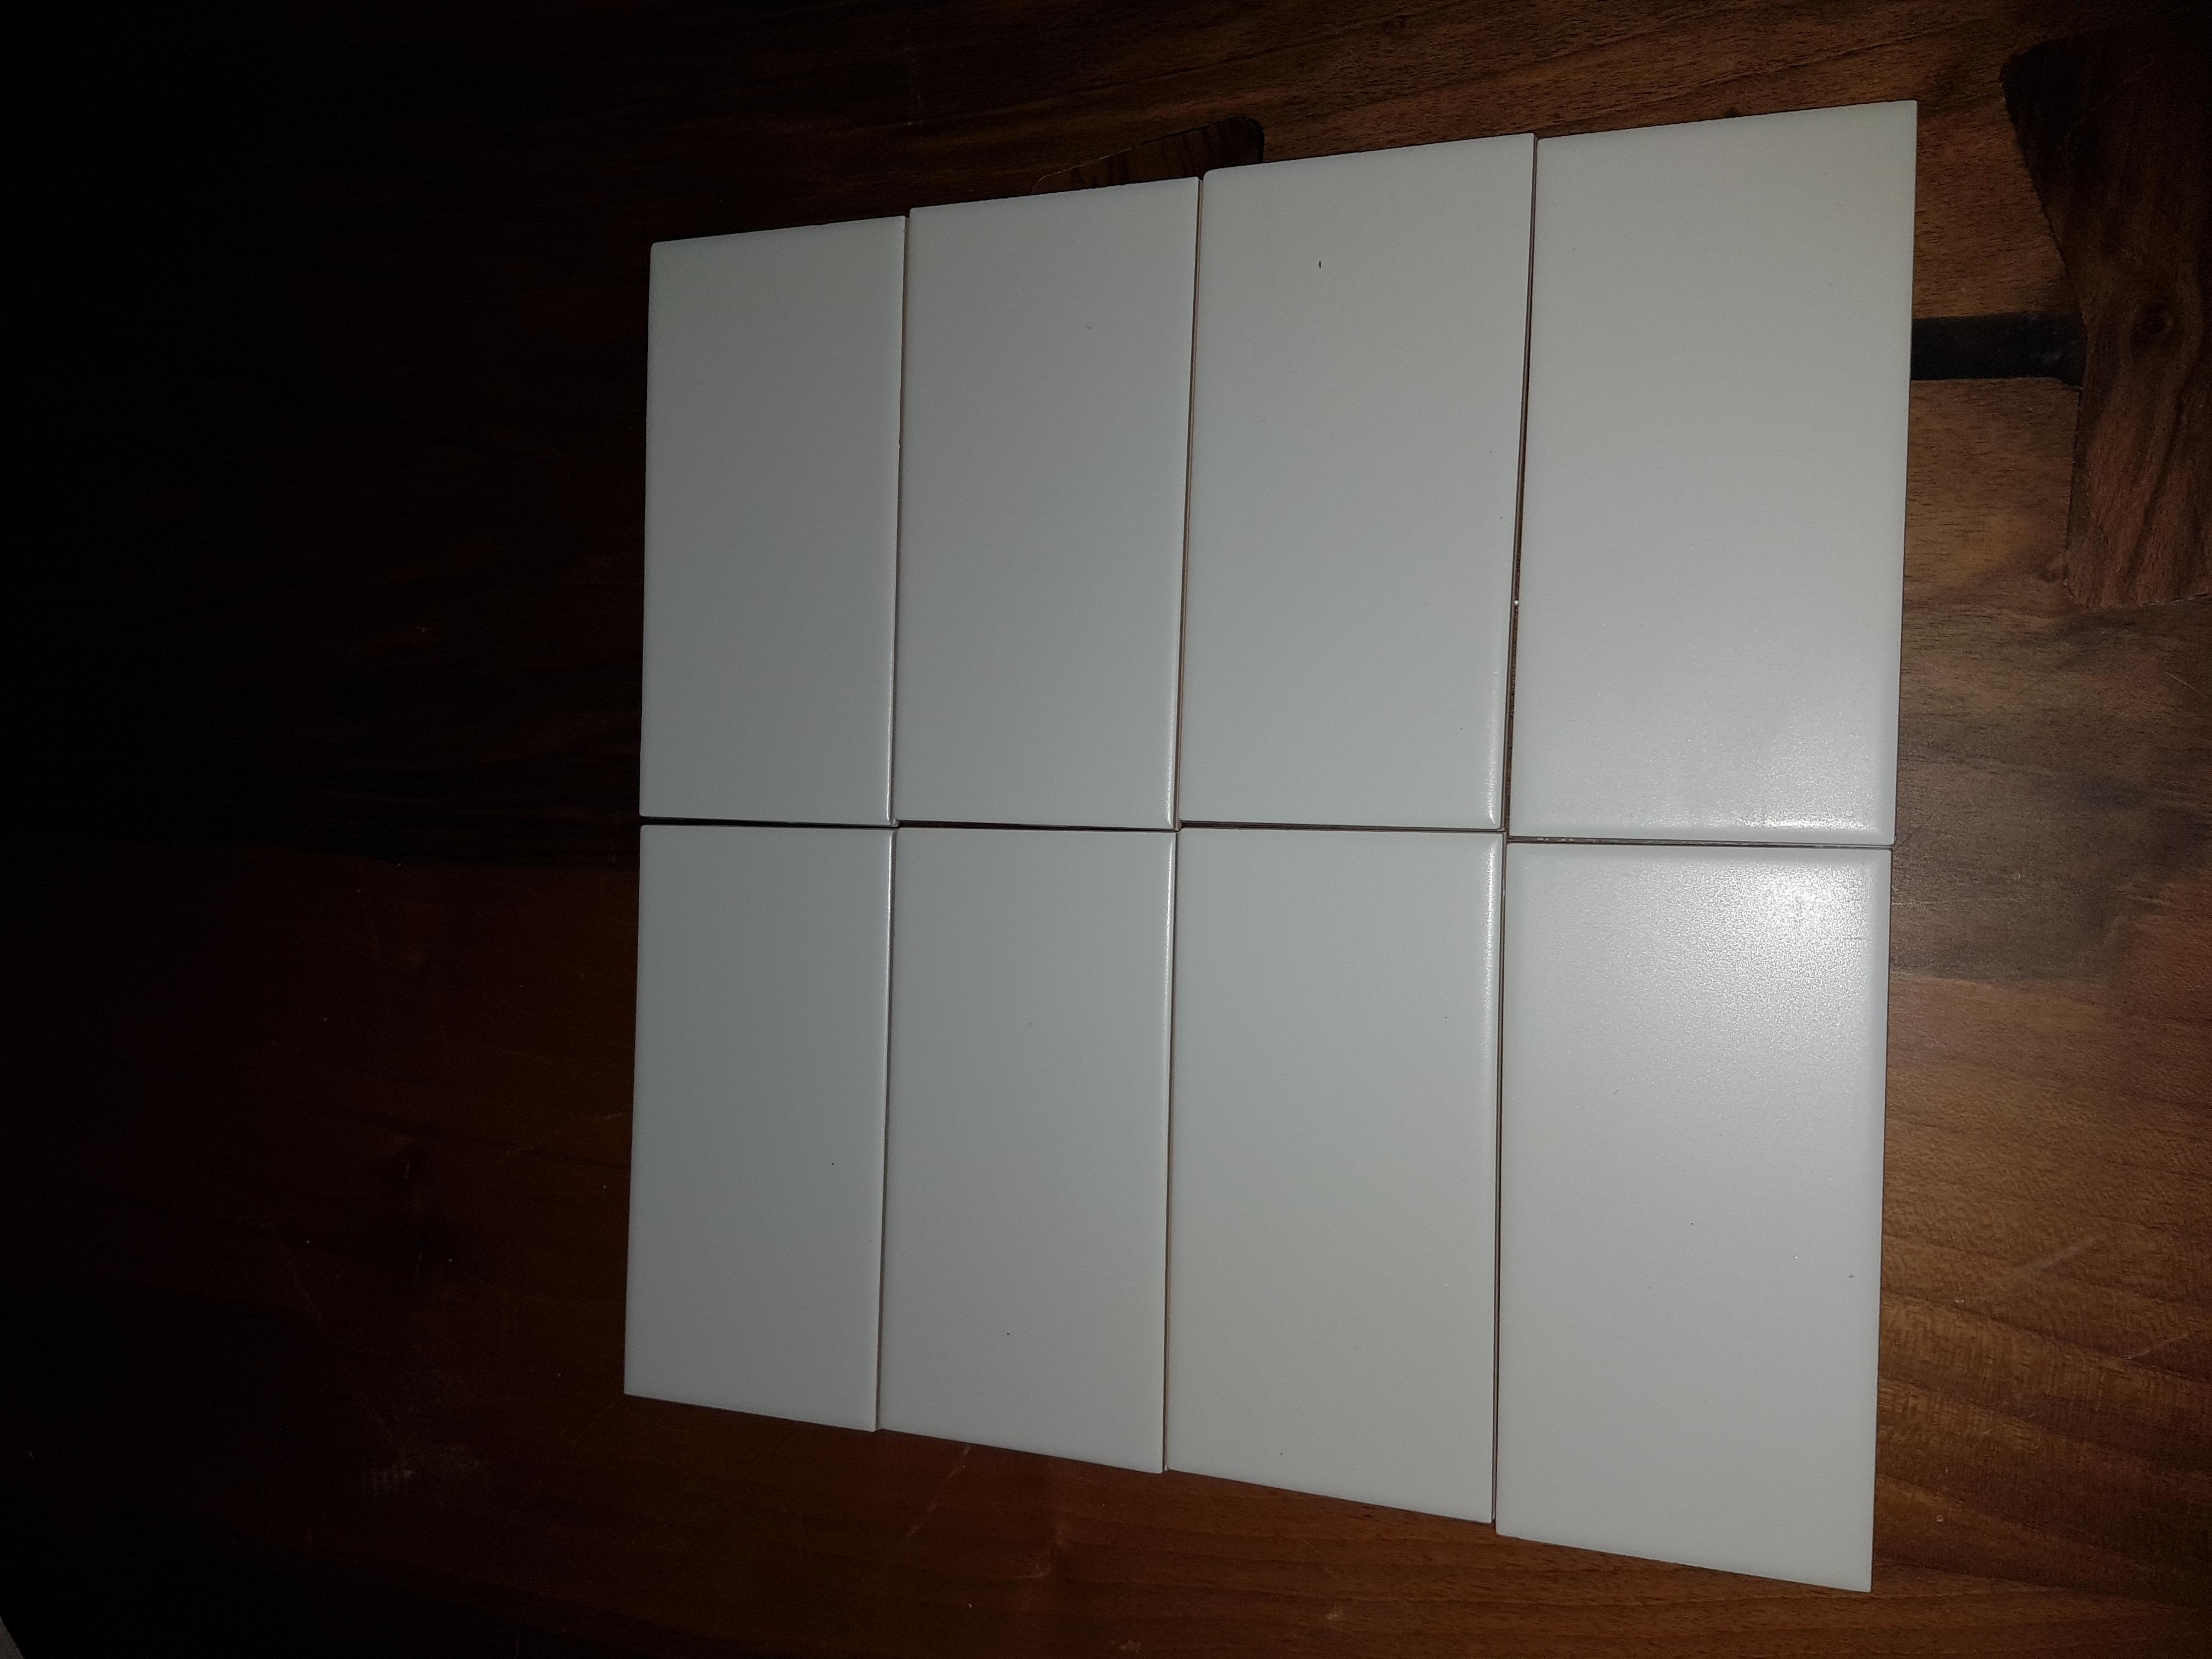 v ggkakel vit matt 7 5x15 kakel online tiles r us ab. Black Bedroom Furniture Sets. Home Design Ideas